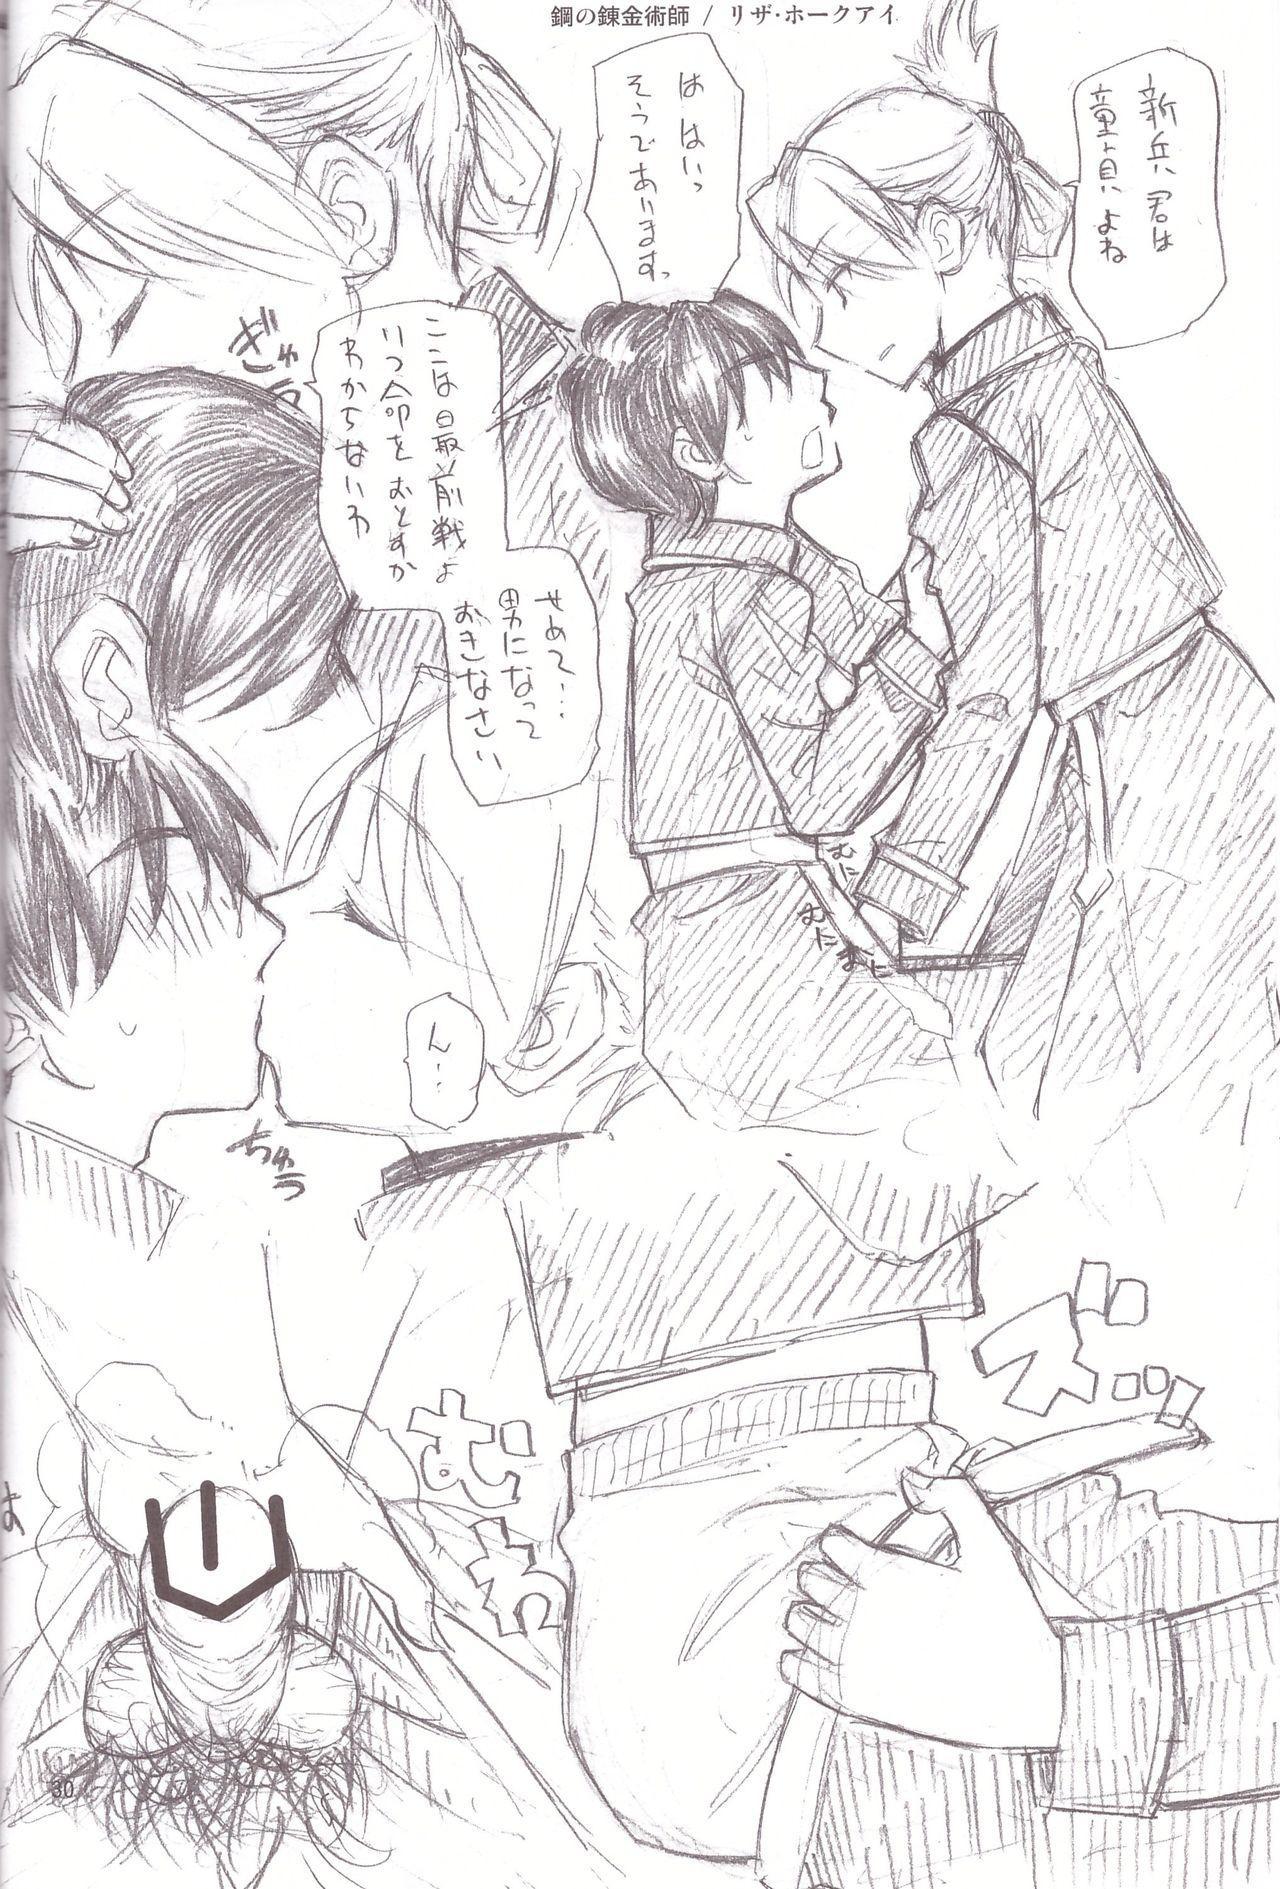 Hentai Fetish's 2 29